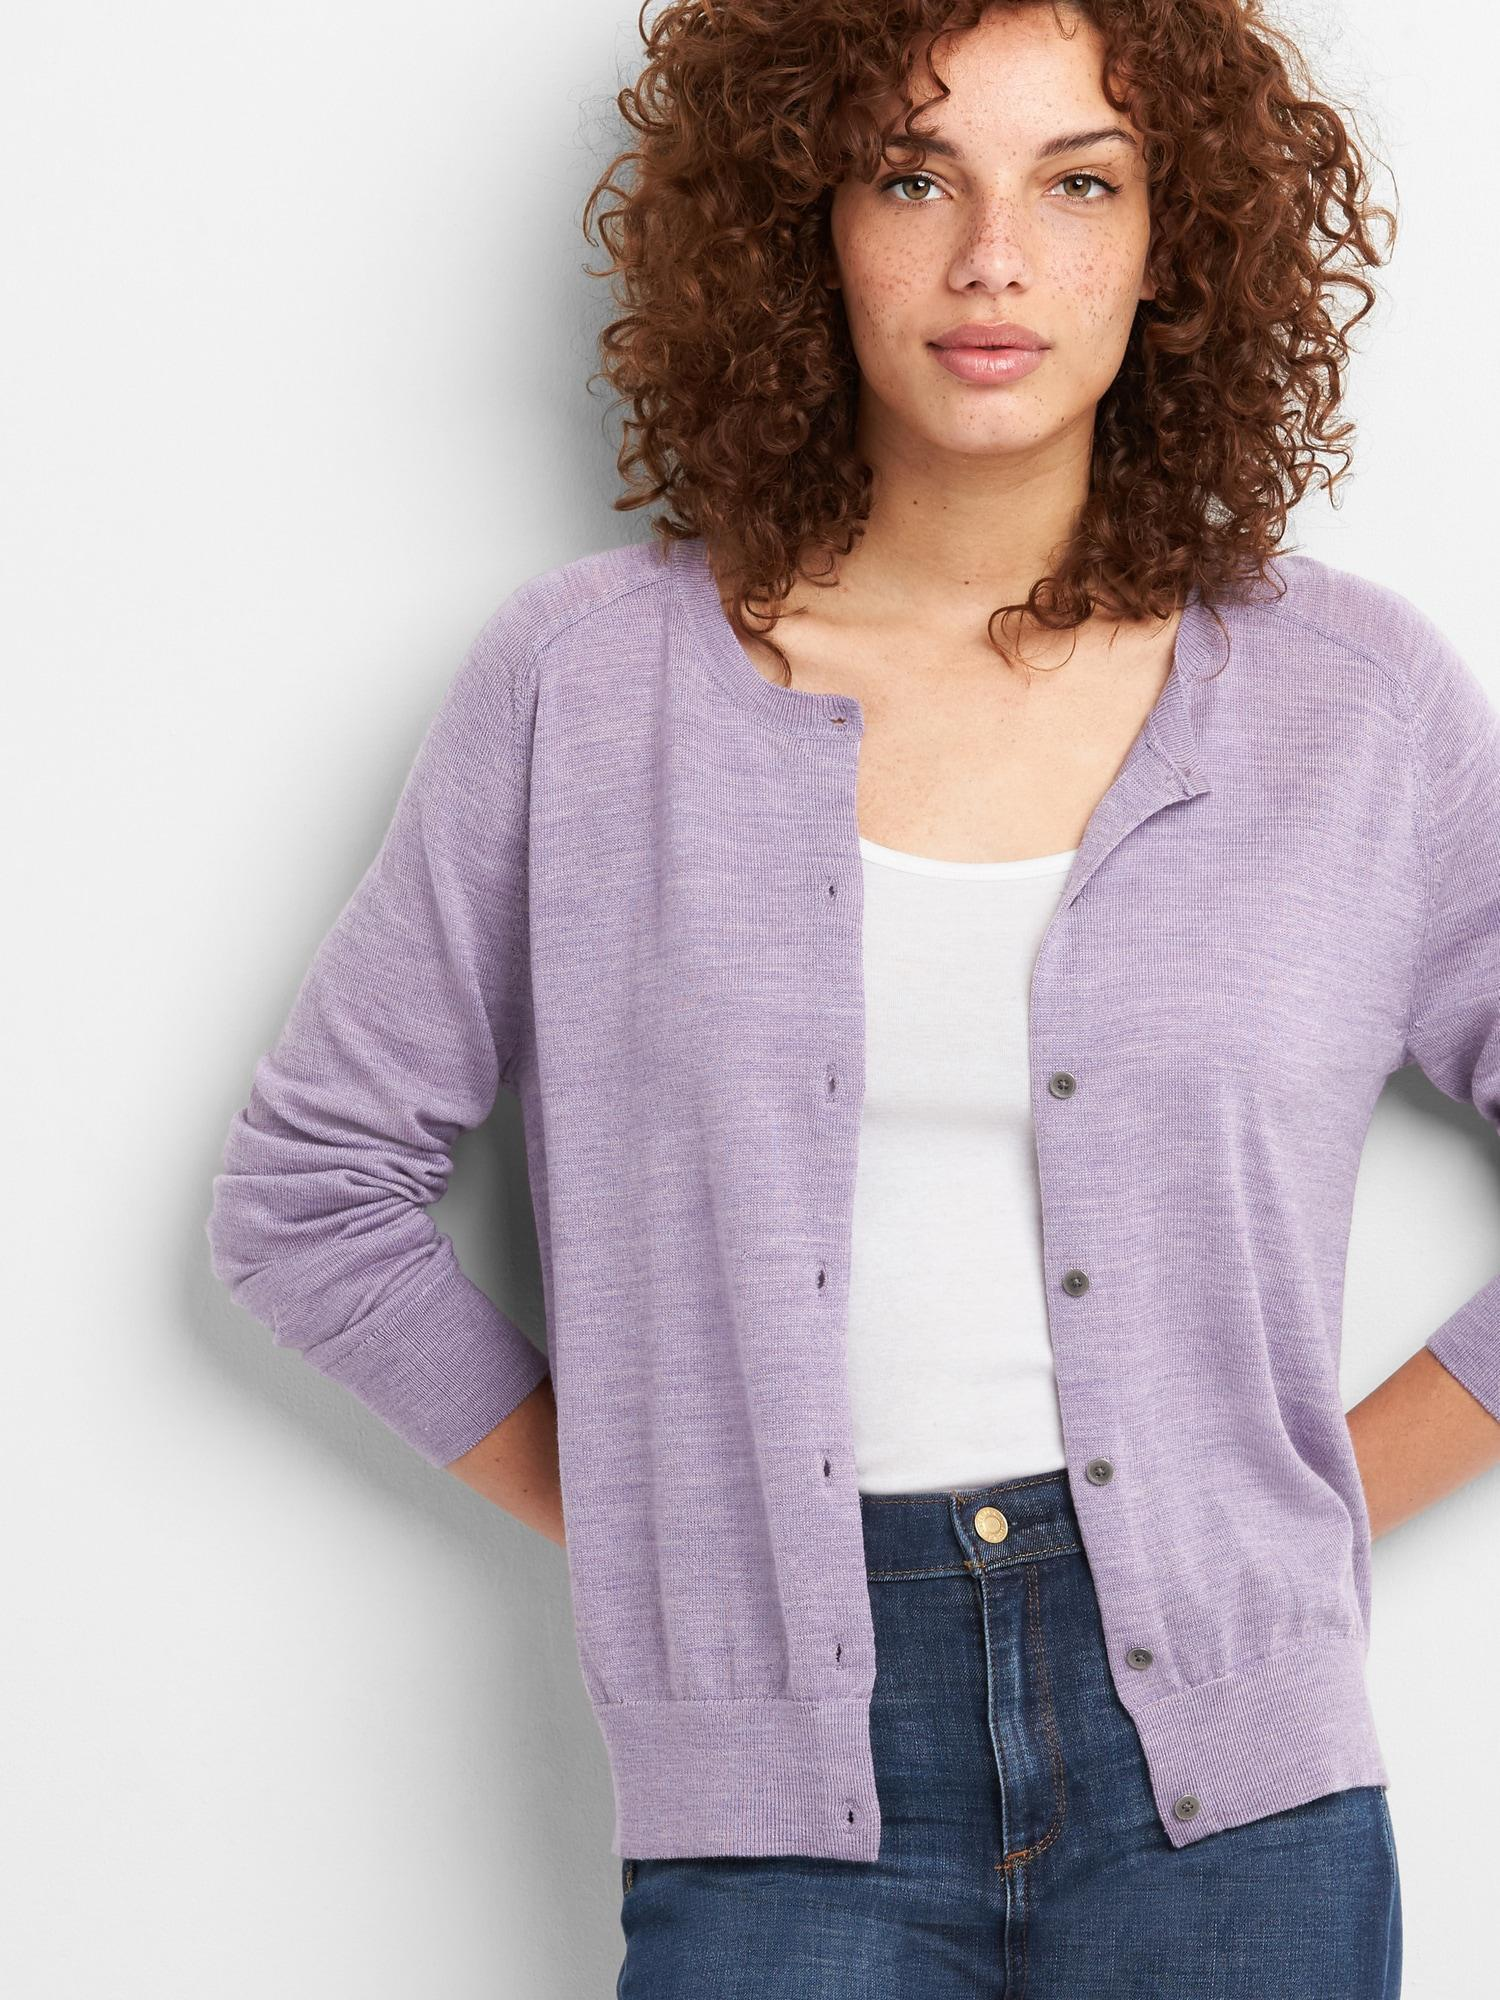 a5ade18f83a1d7 Gap Crewneck Cardigan Sweater In Merino Wool in Purple - Lyst